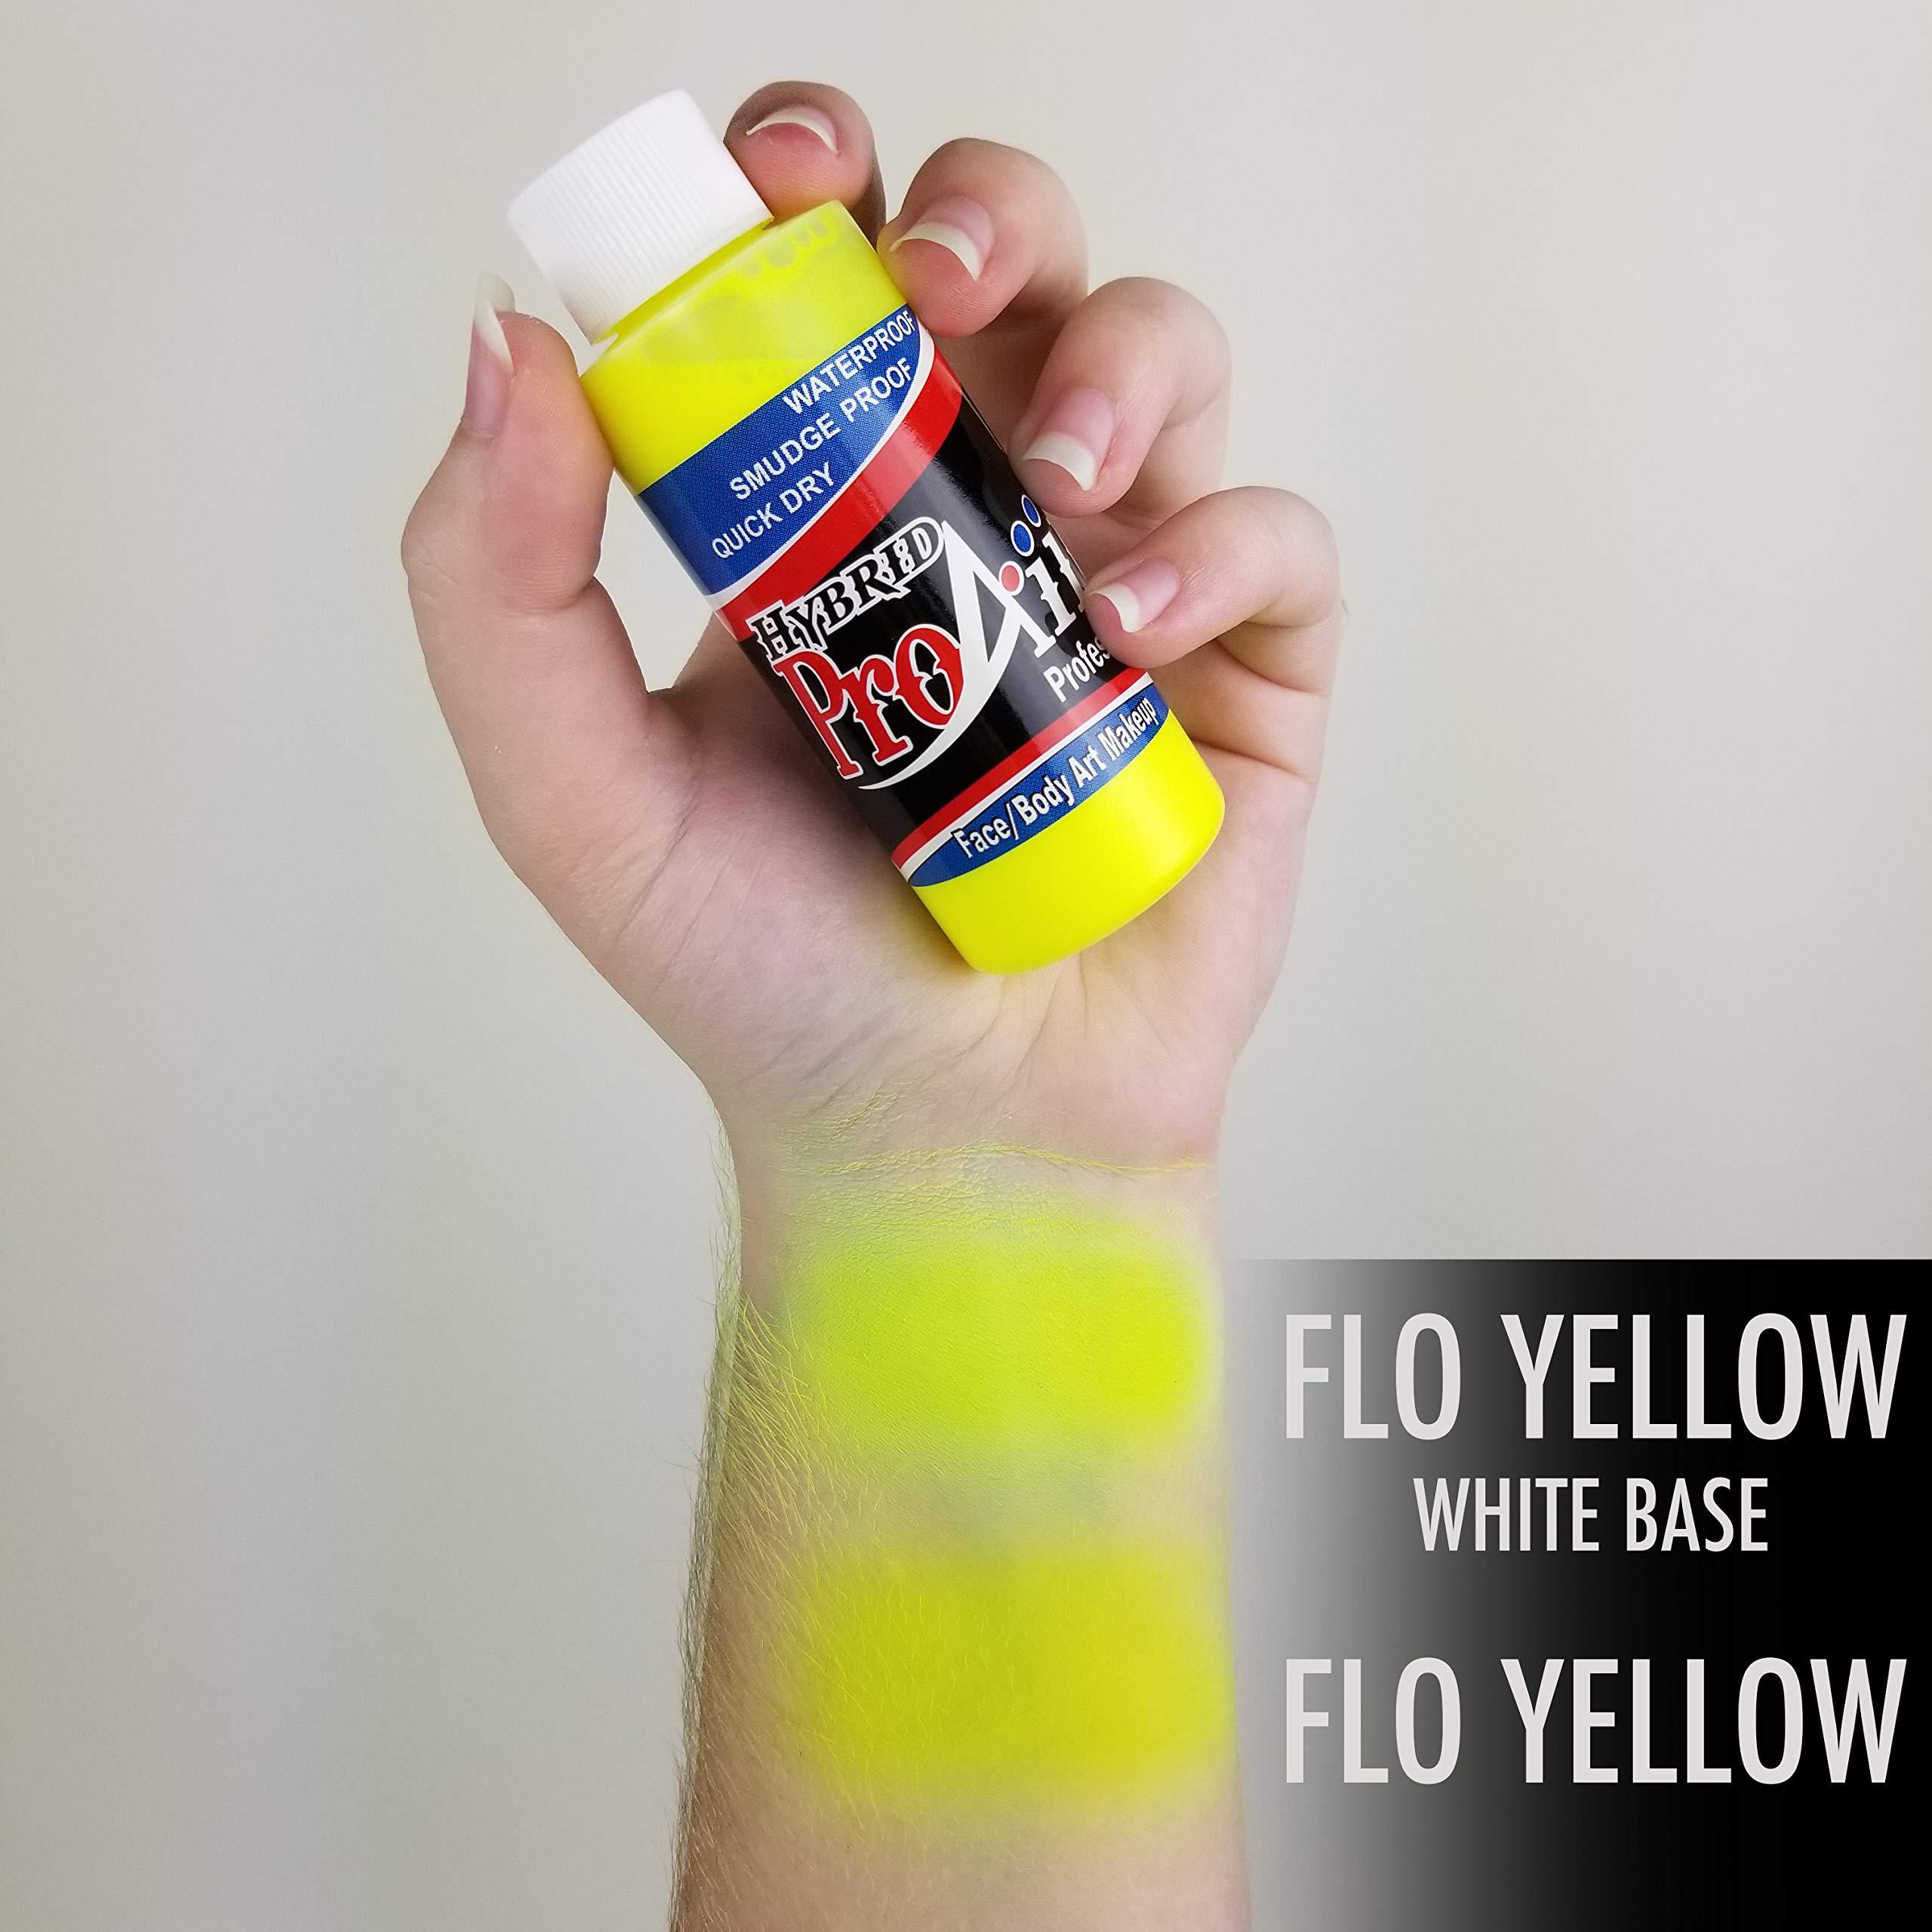 Face Painting Makeup - ProAiir Waterproof Makeup - Set of 6 UV/Fluorescents - 1 oz (30ml) by ShowOffs Body Art